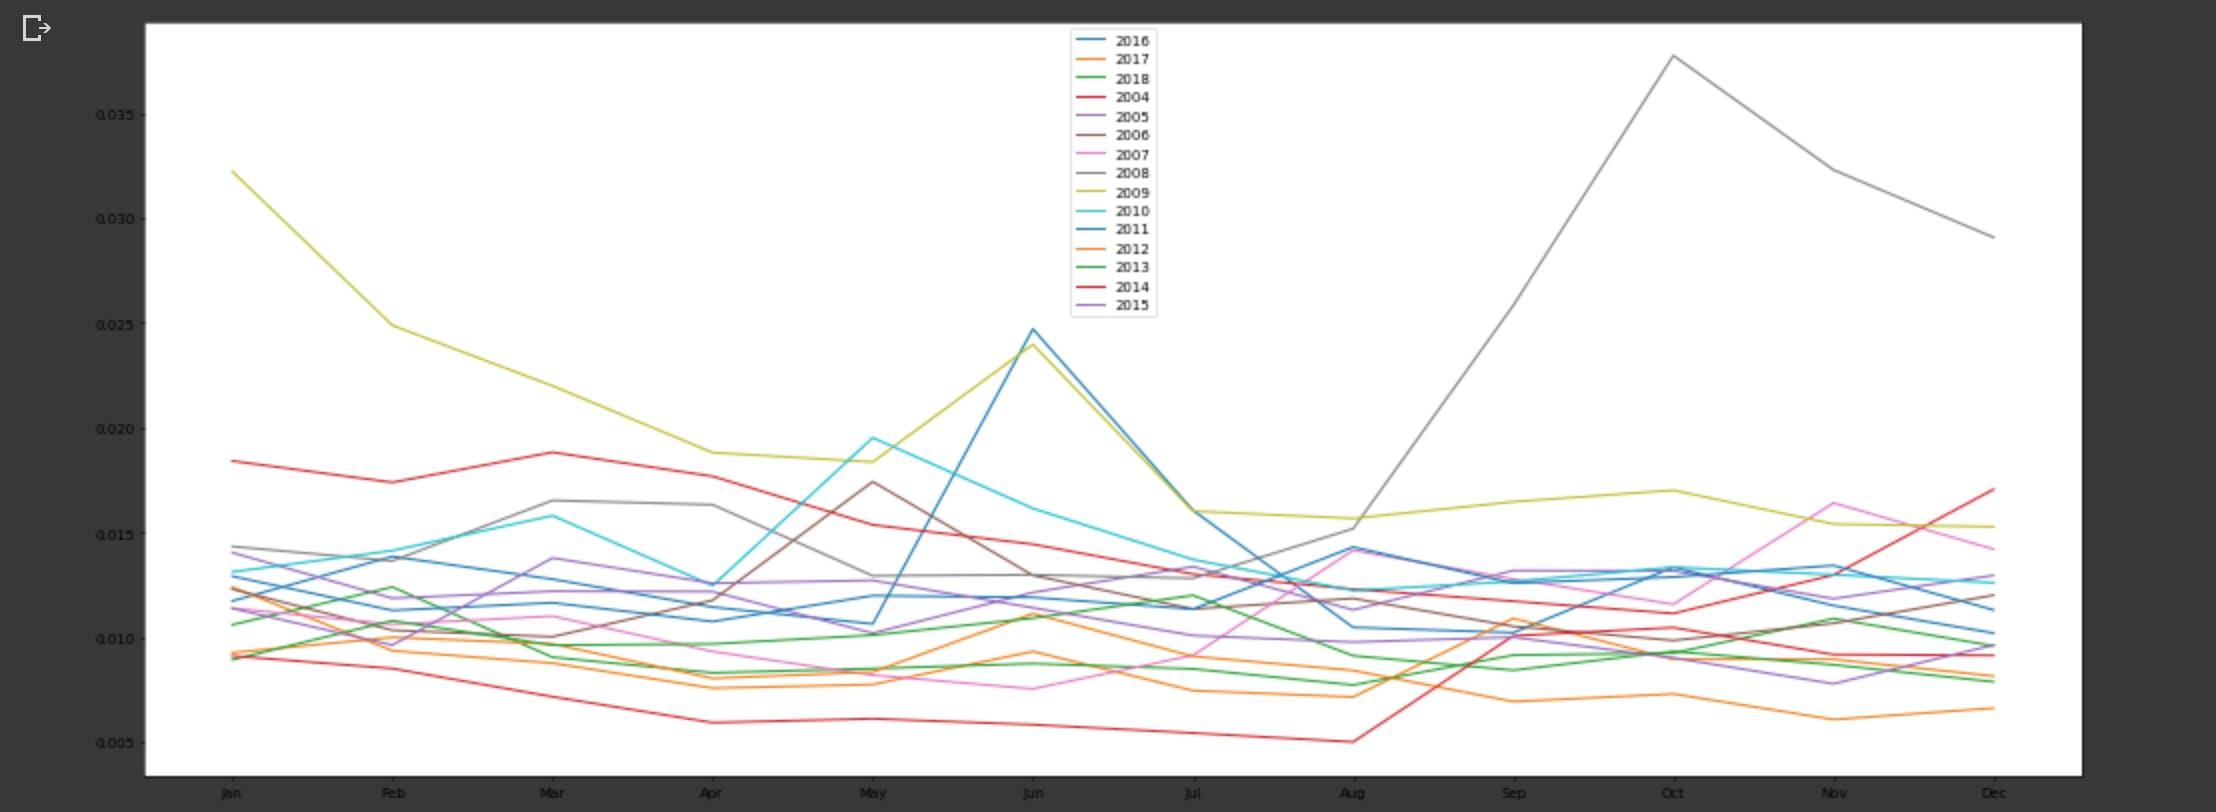 ML 為替予測の為のデータ分析-月毎のtick数とボラリティ比較分析 ...